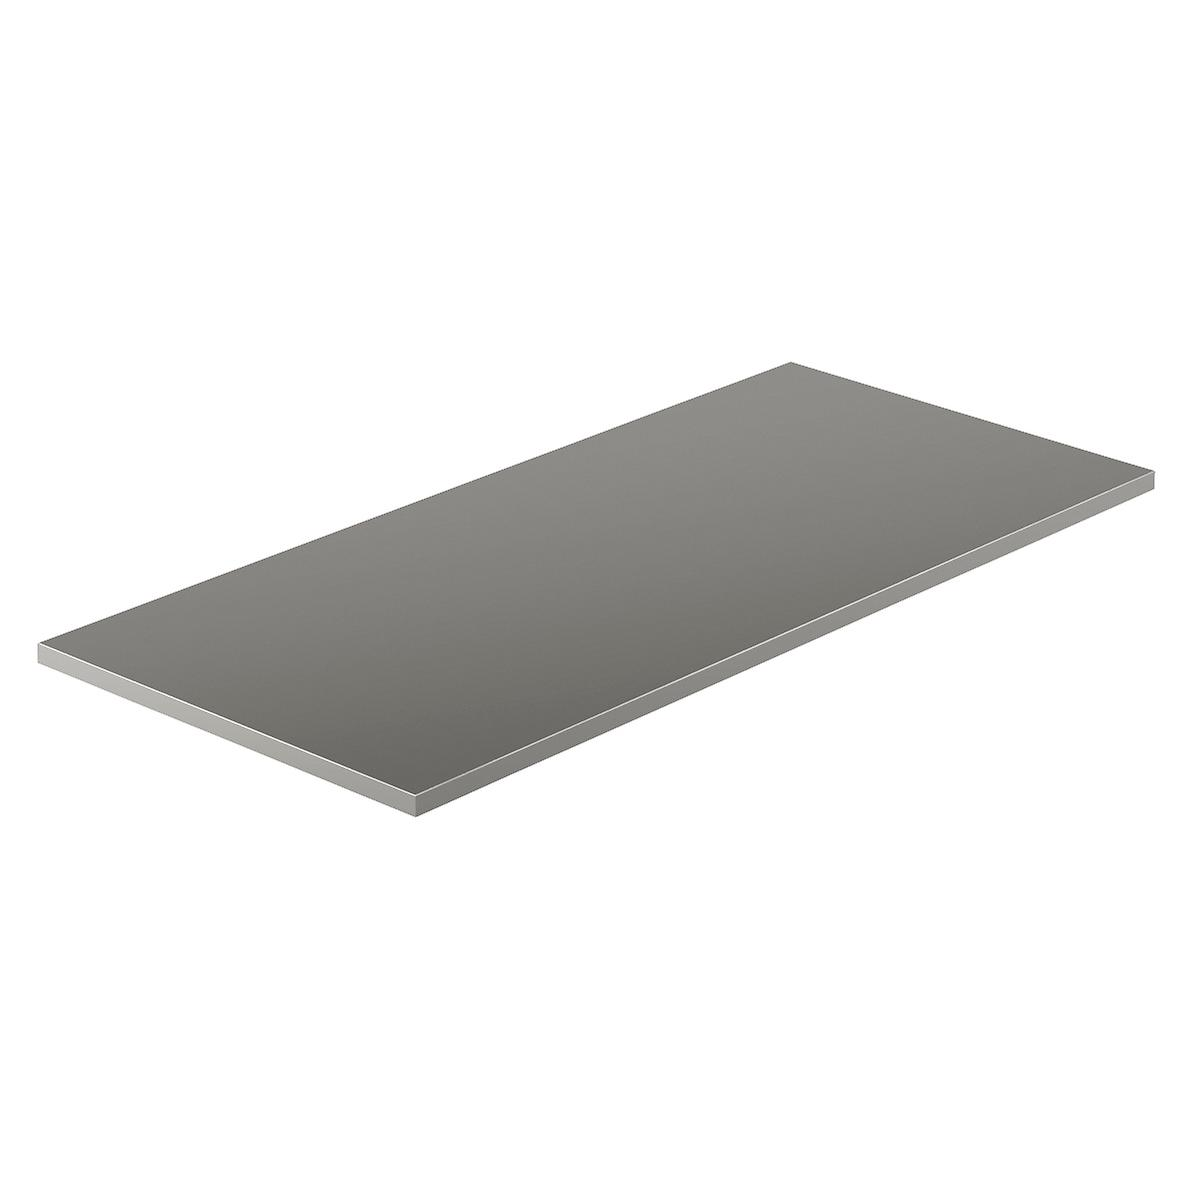 Grey Melamine Desk Top